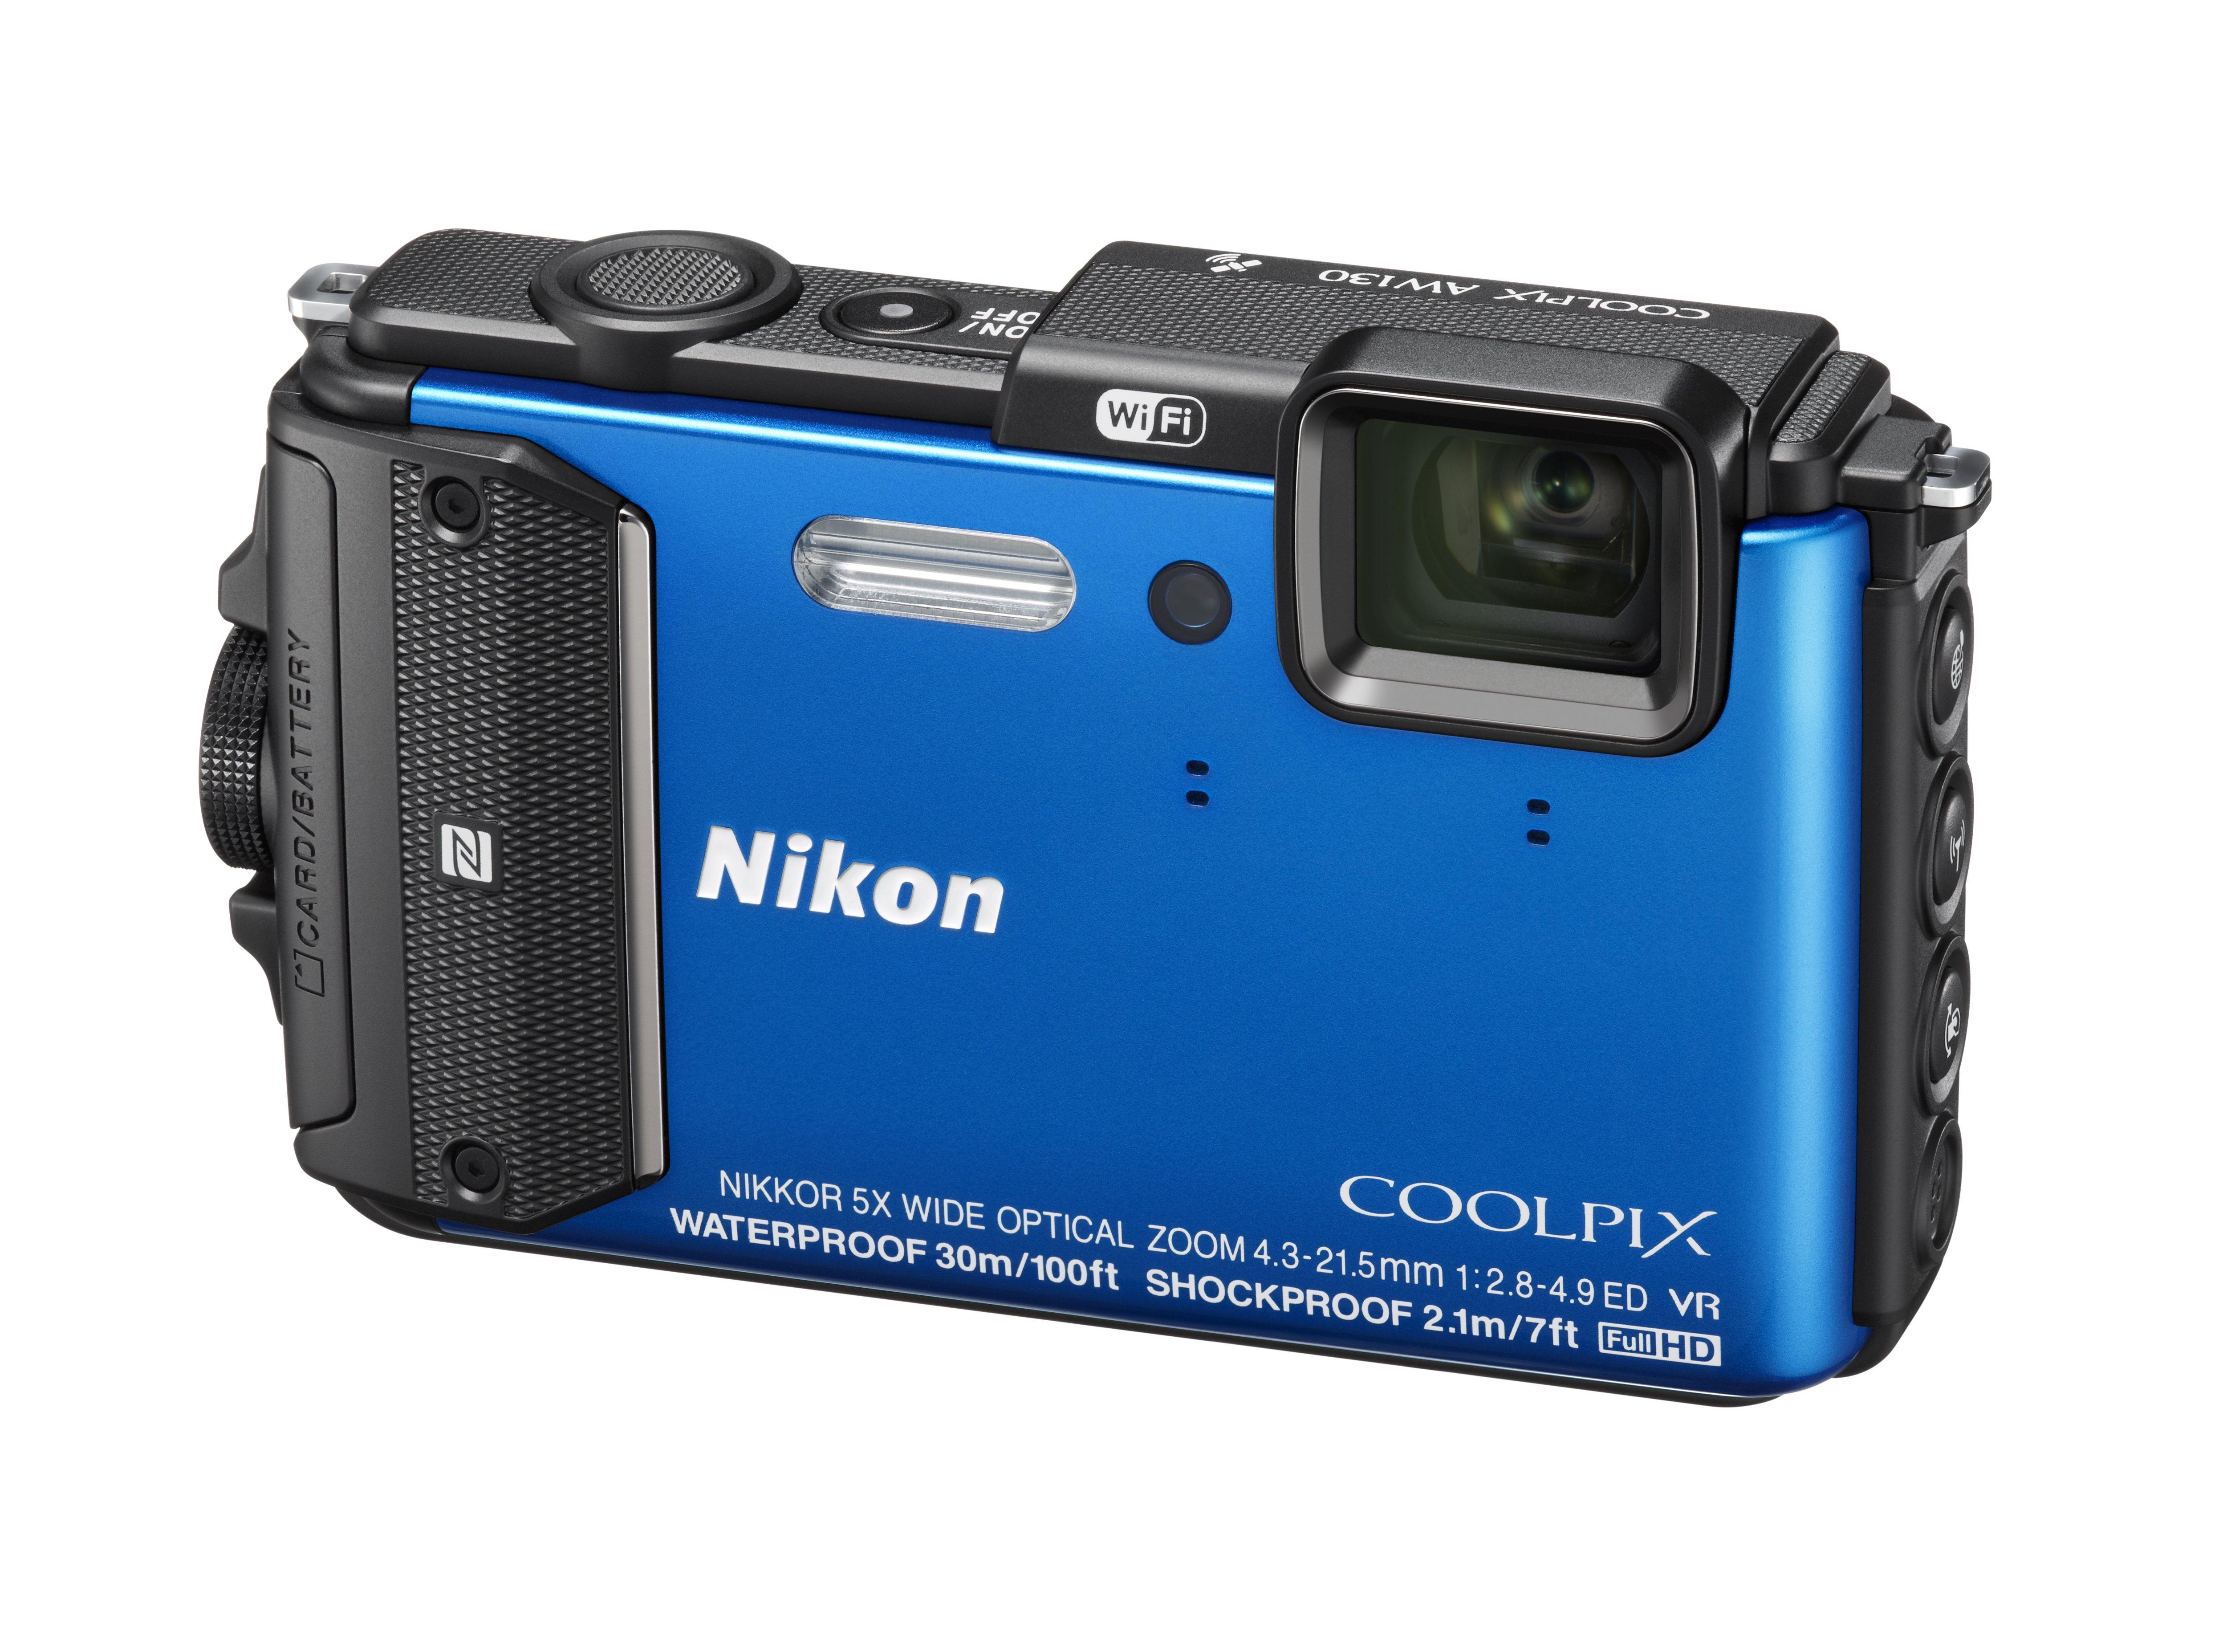 NIKON COOLPIX AW130 modrý + SDHC 16 GB